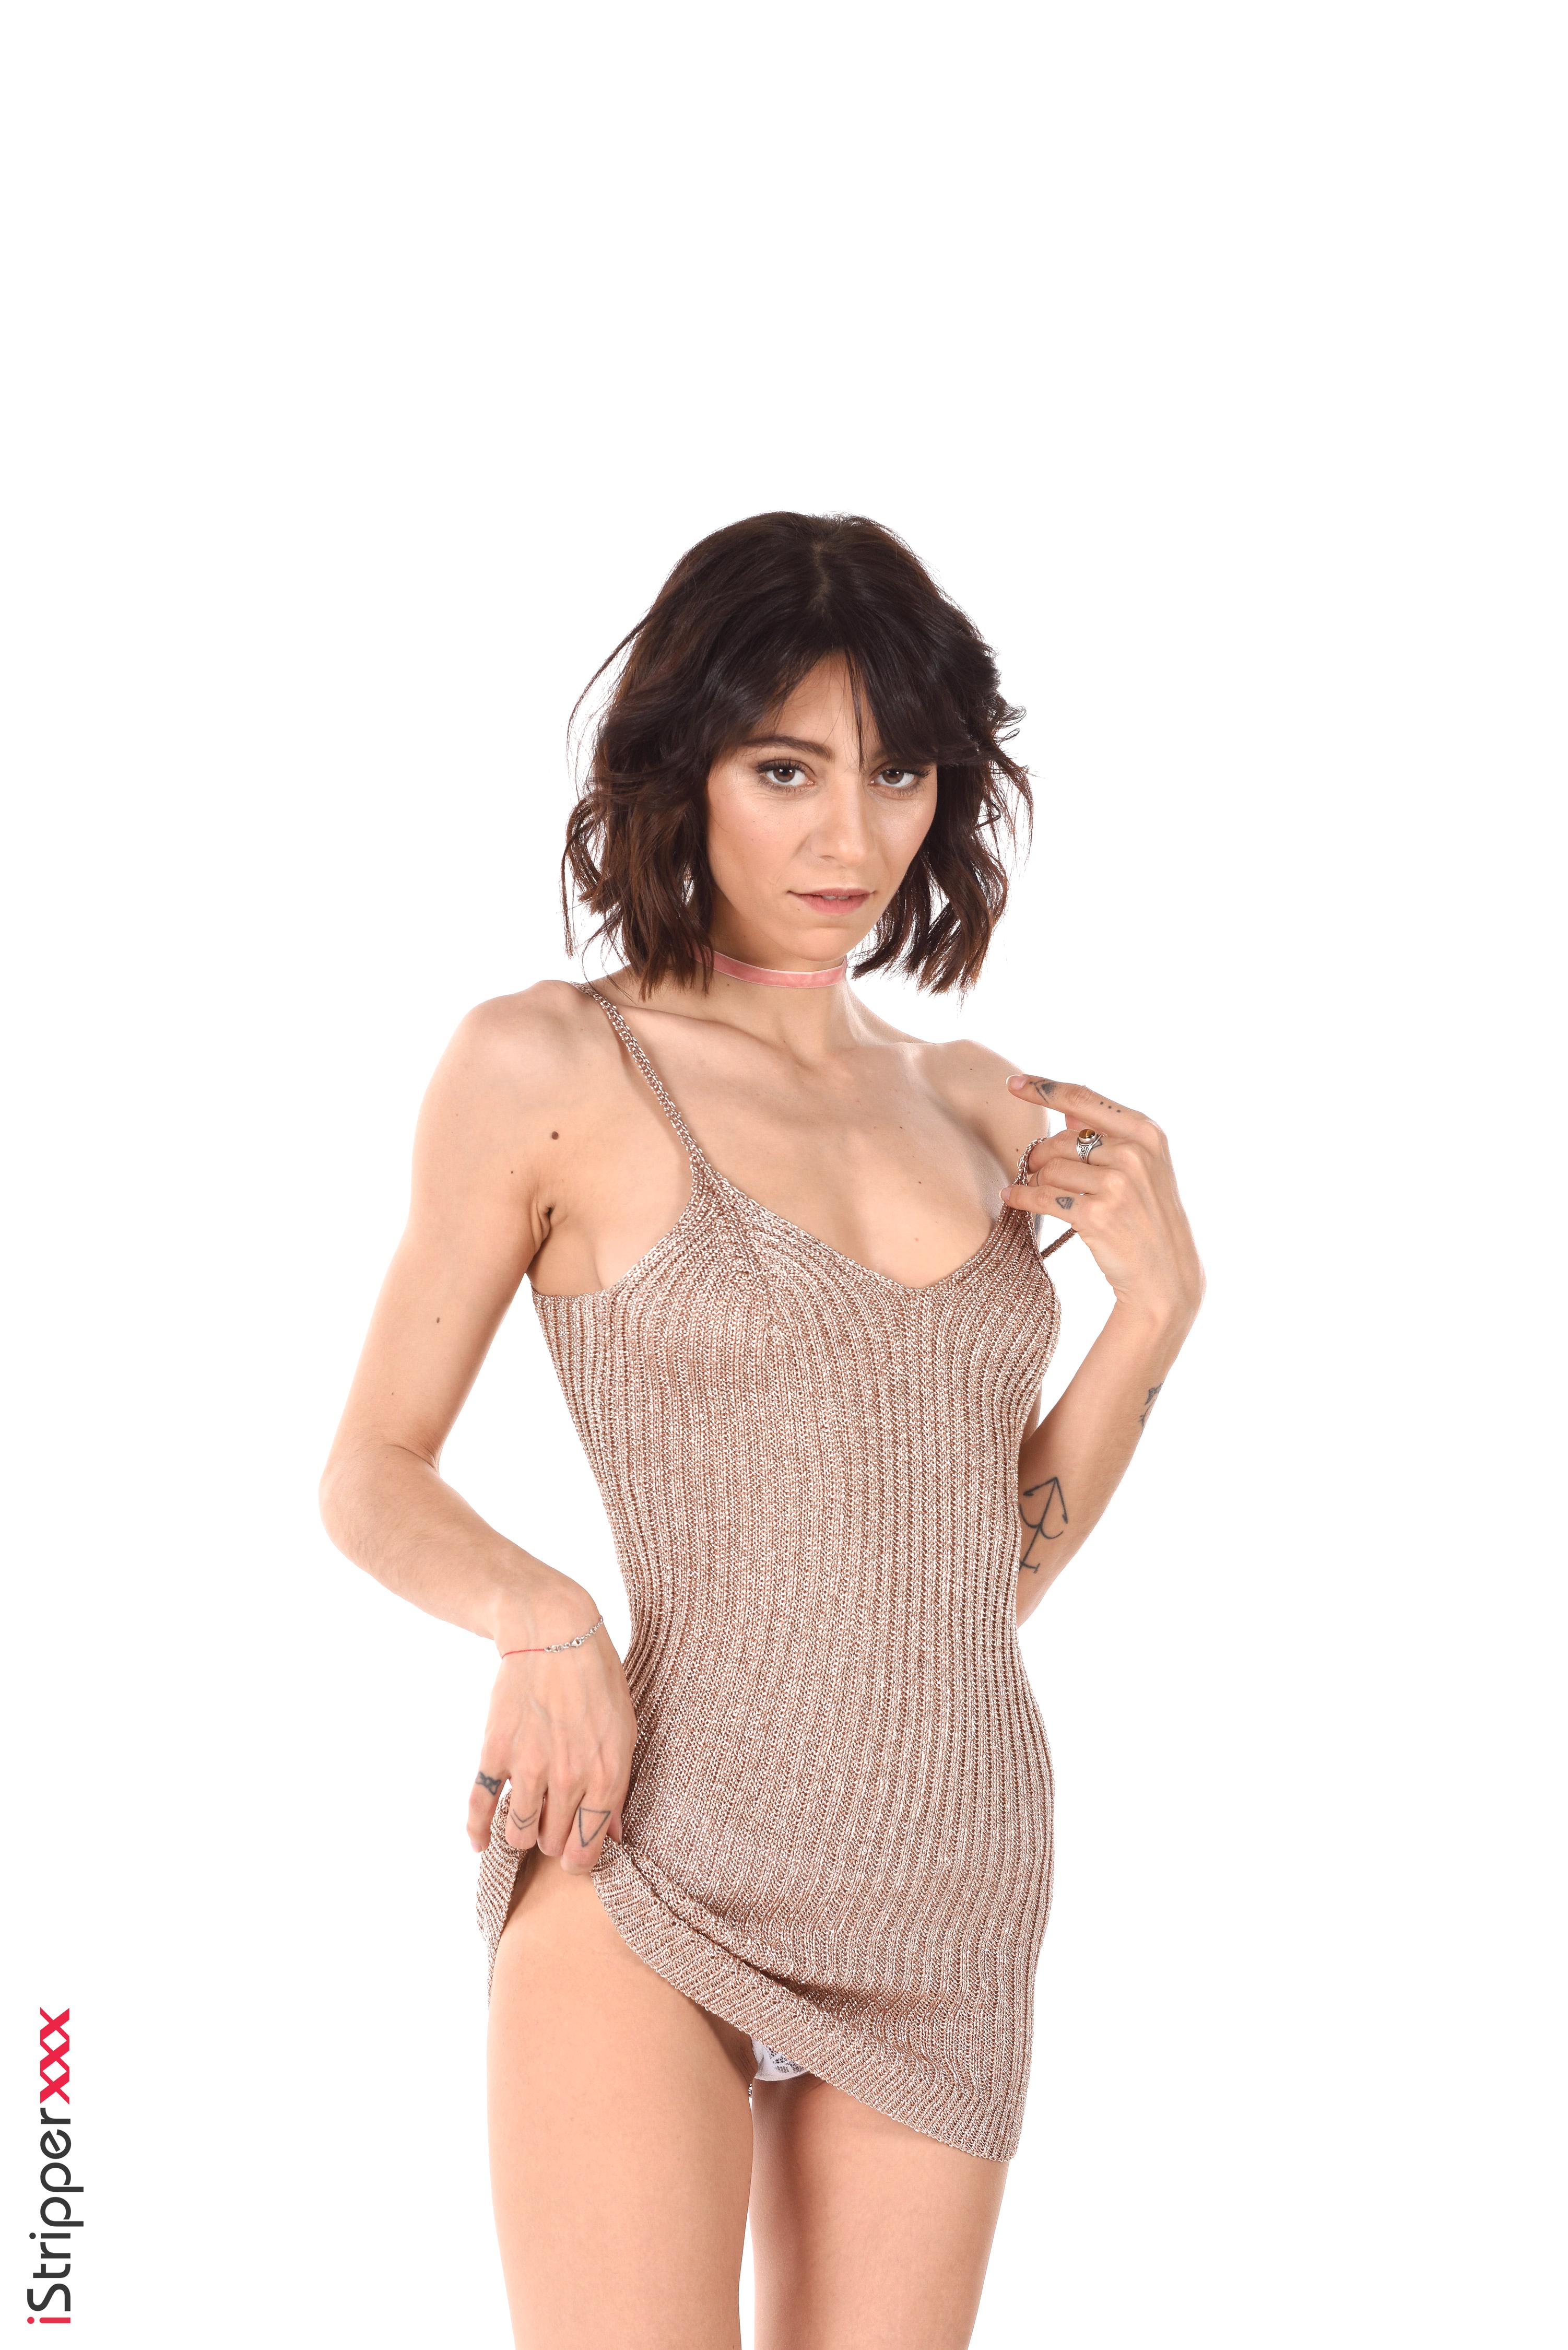 sexy nude wallpaper